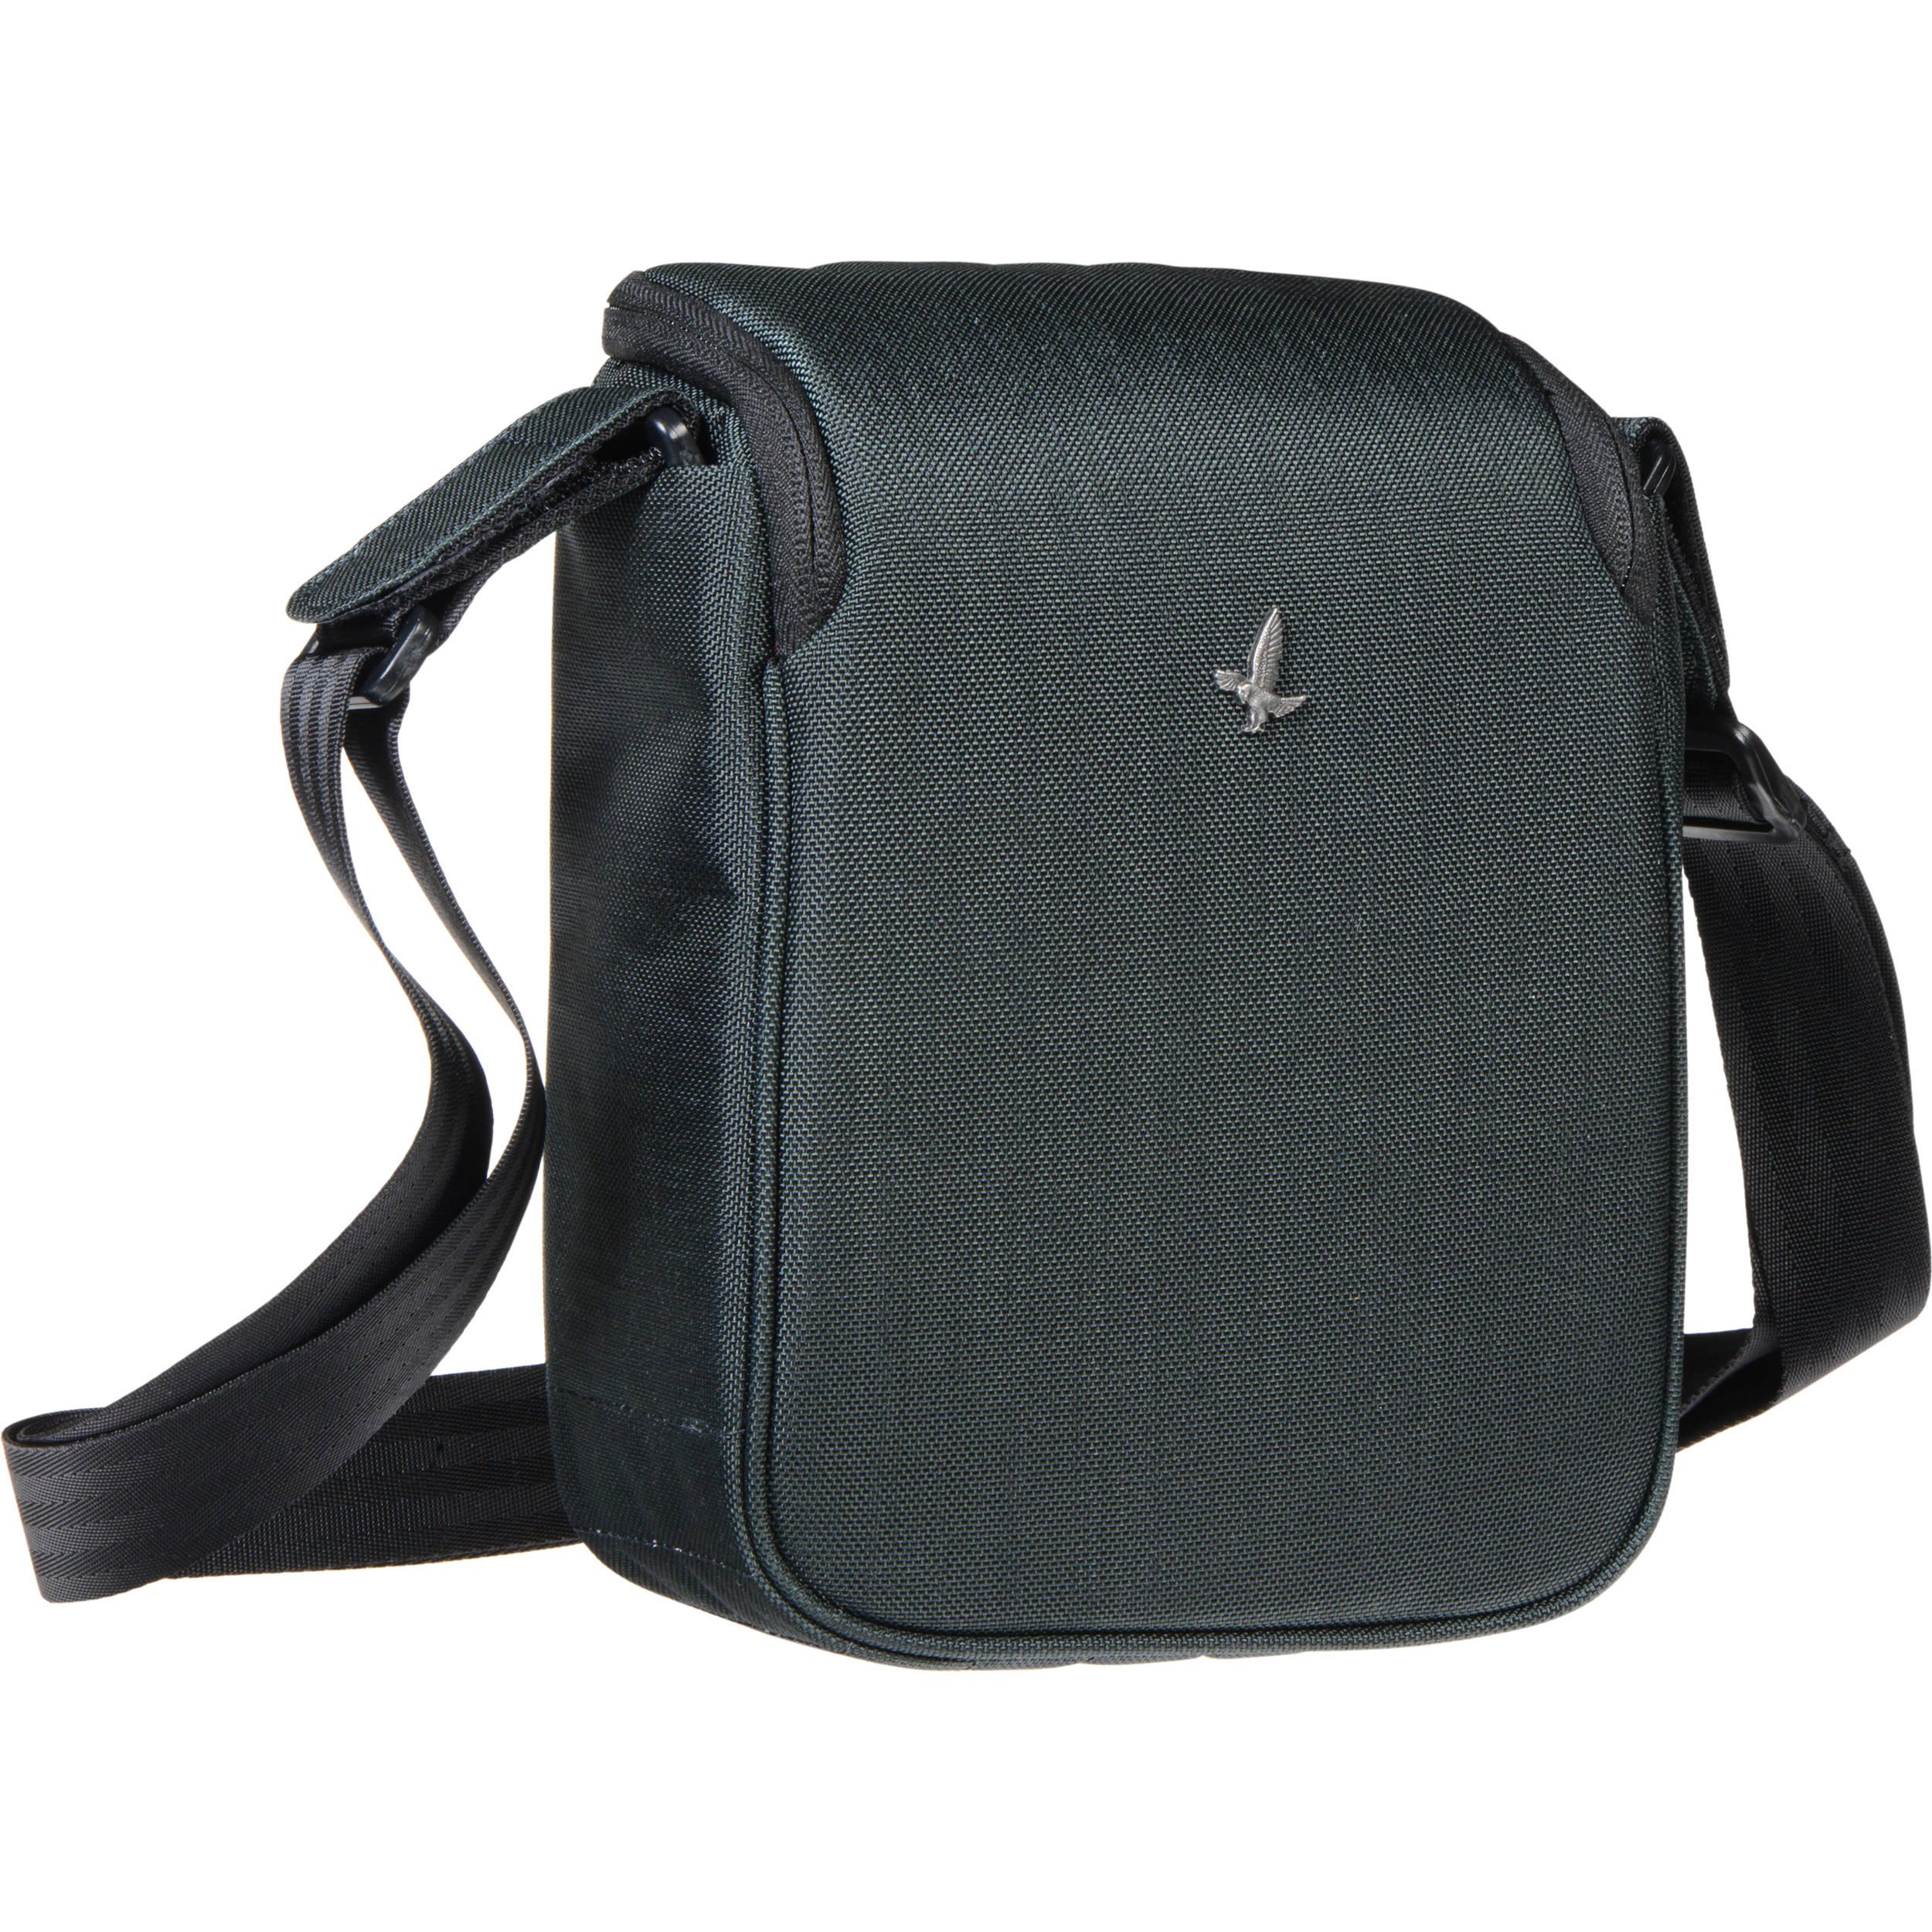 Swarovski Field Bag Nbsp Large Pro For El Range Binocular Rangefinder